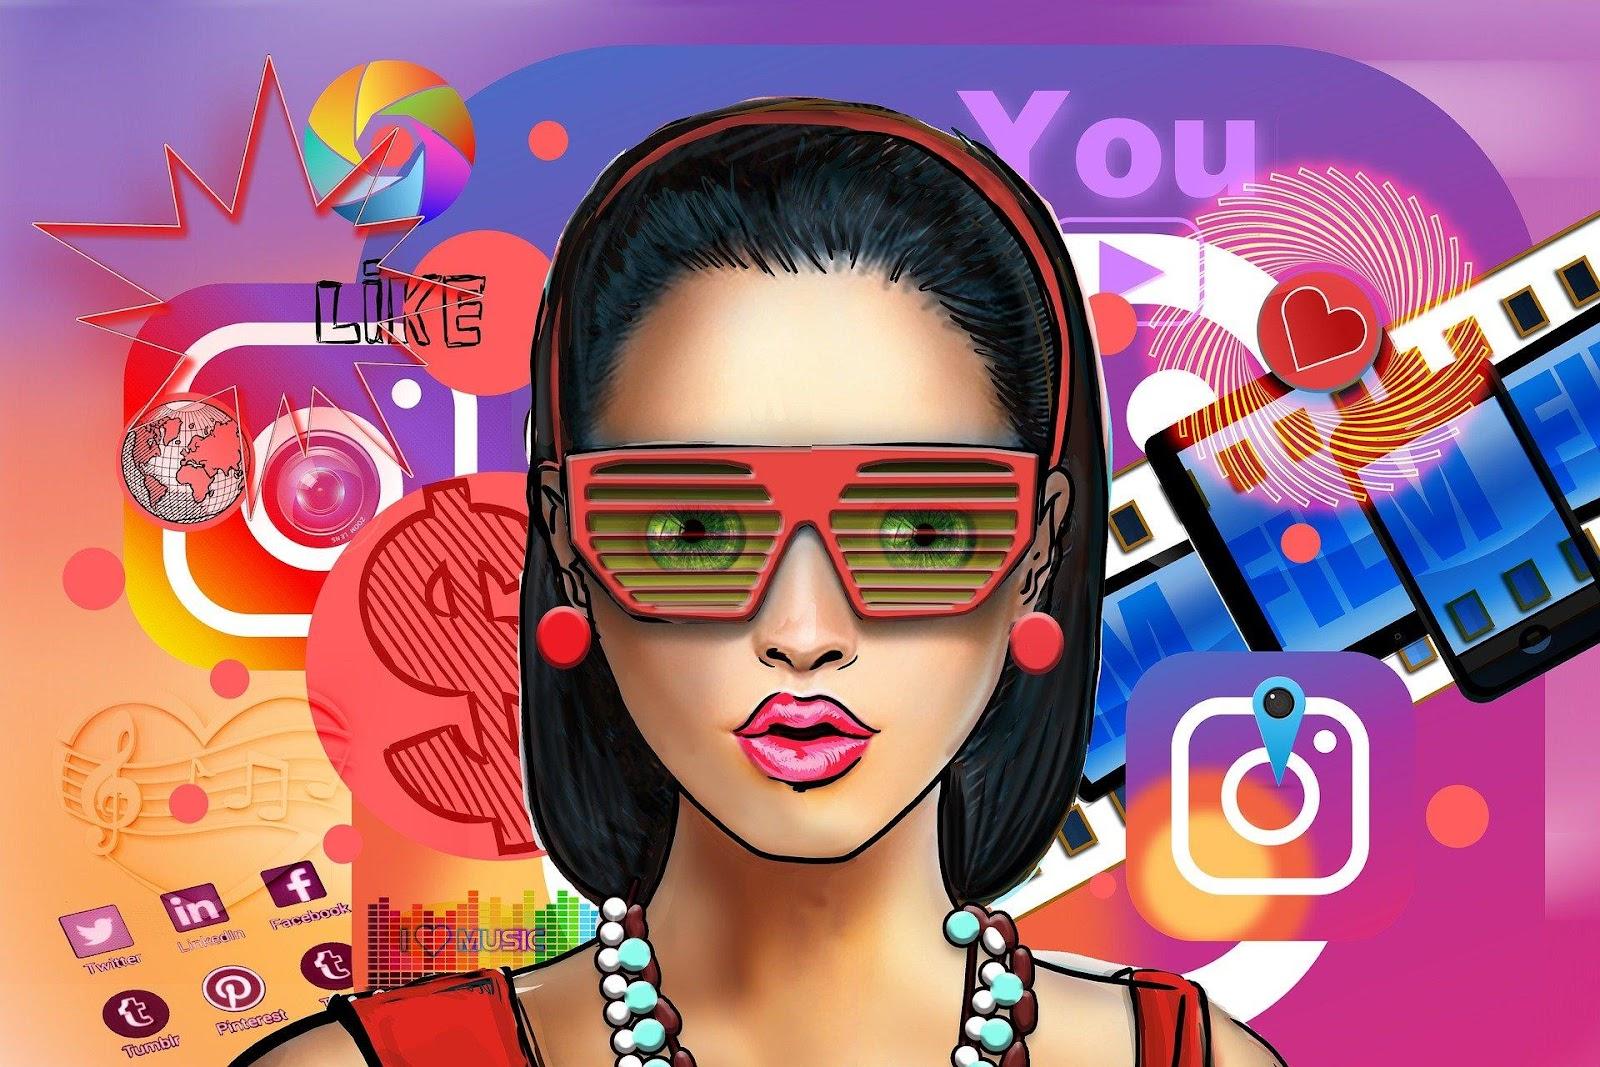 F:\Sohel\Brett\afluencer.com\Jennie articles\images\Beauty Influencers marketing.jpg